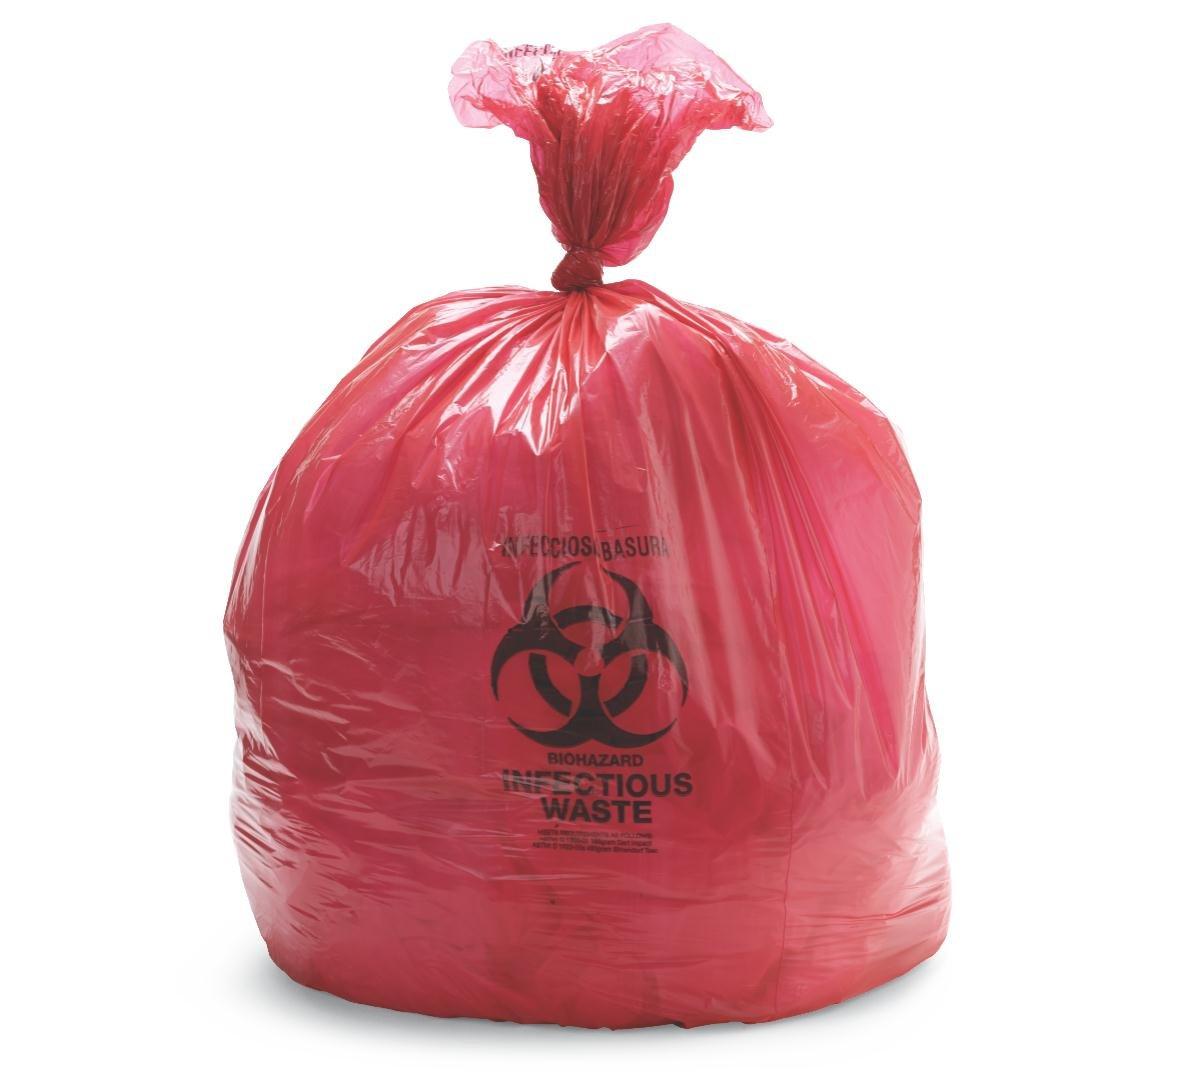 Clear 61 x 76cm Tufpak 1112-2430 Autoclavable Biohazard Bags 24 x 30